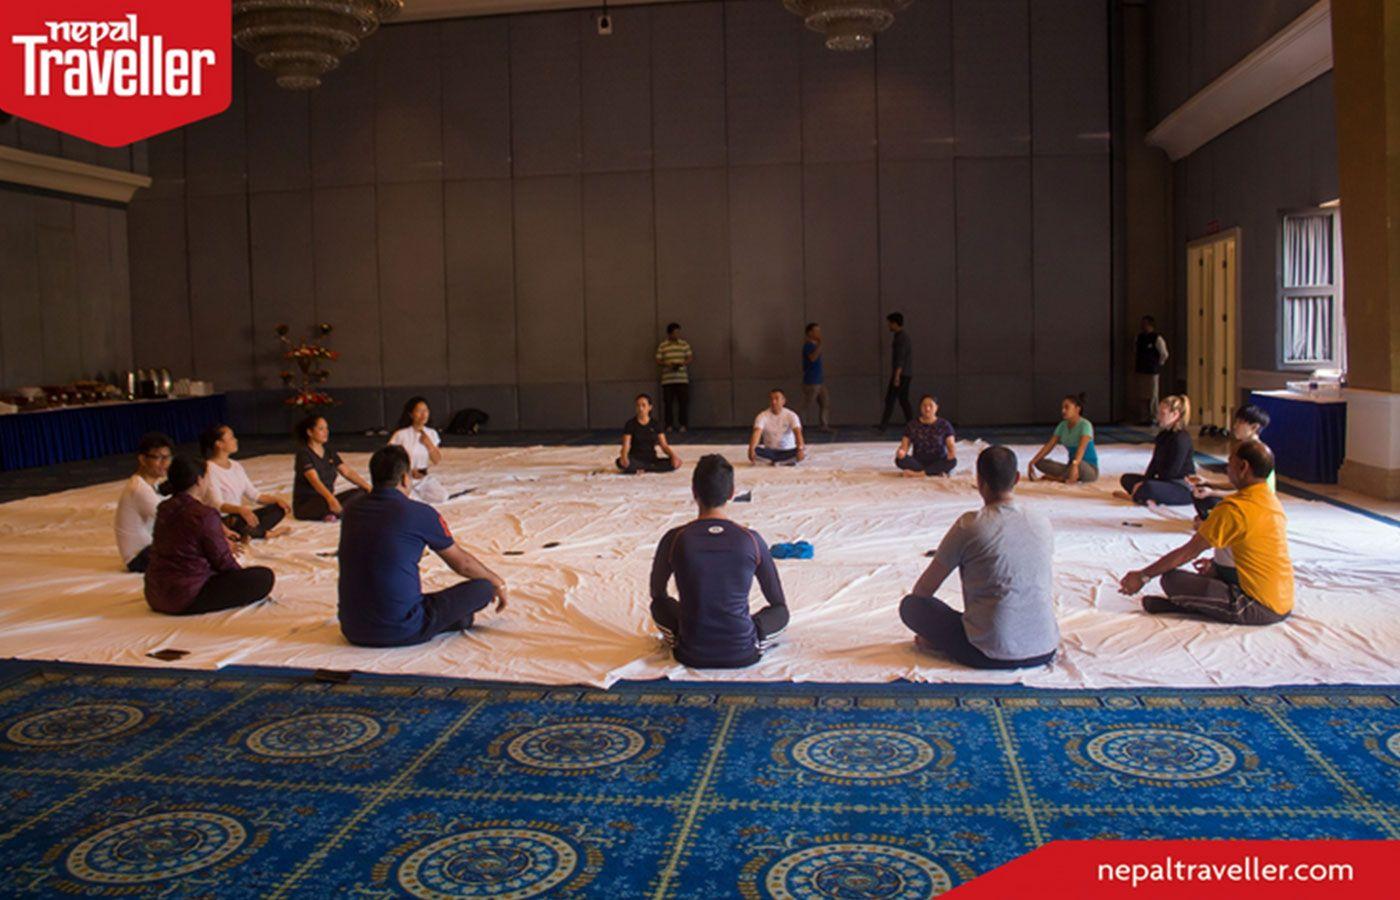 Hotel Yak & Yeti Celebrates International Yoga Day